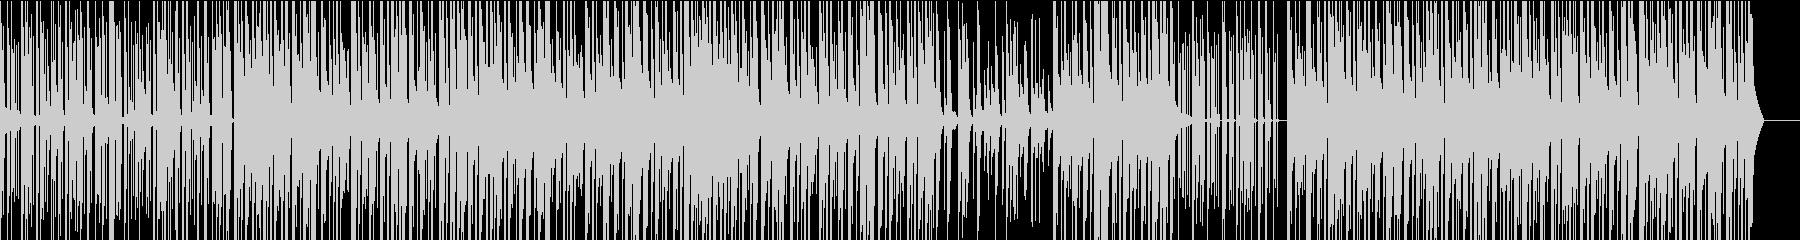 TRAP ピアノ - アンダーグランドの未再生の波形